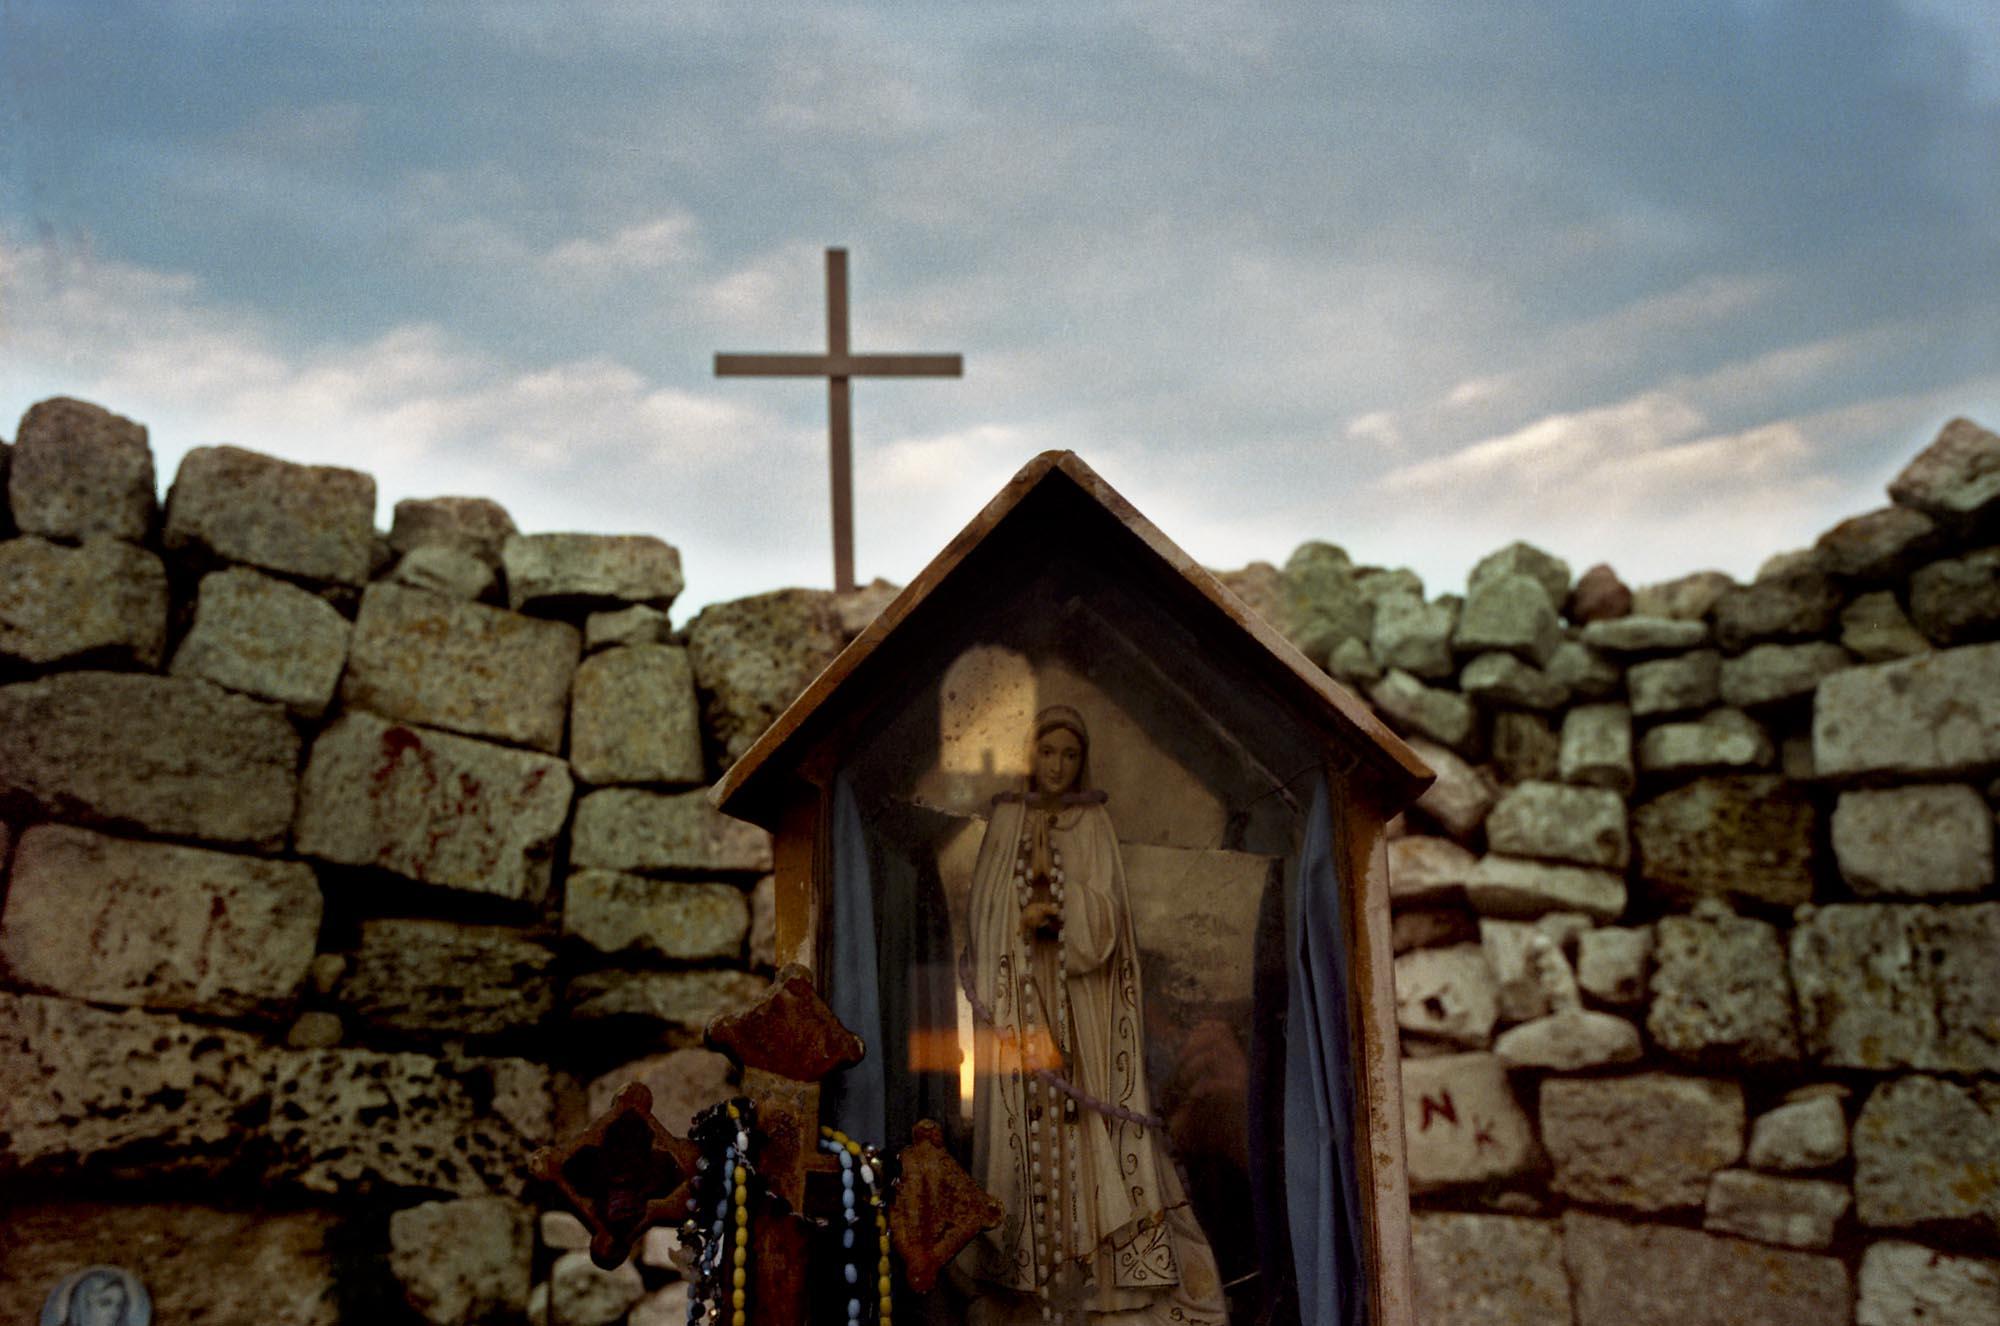 Taybeh, Christian Village, West Bank 2003